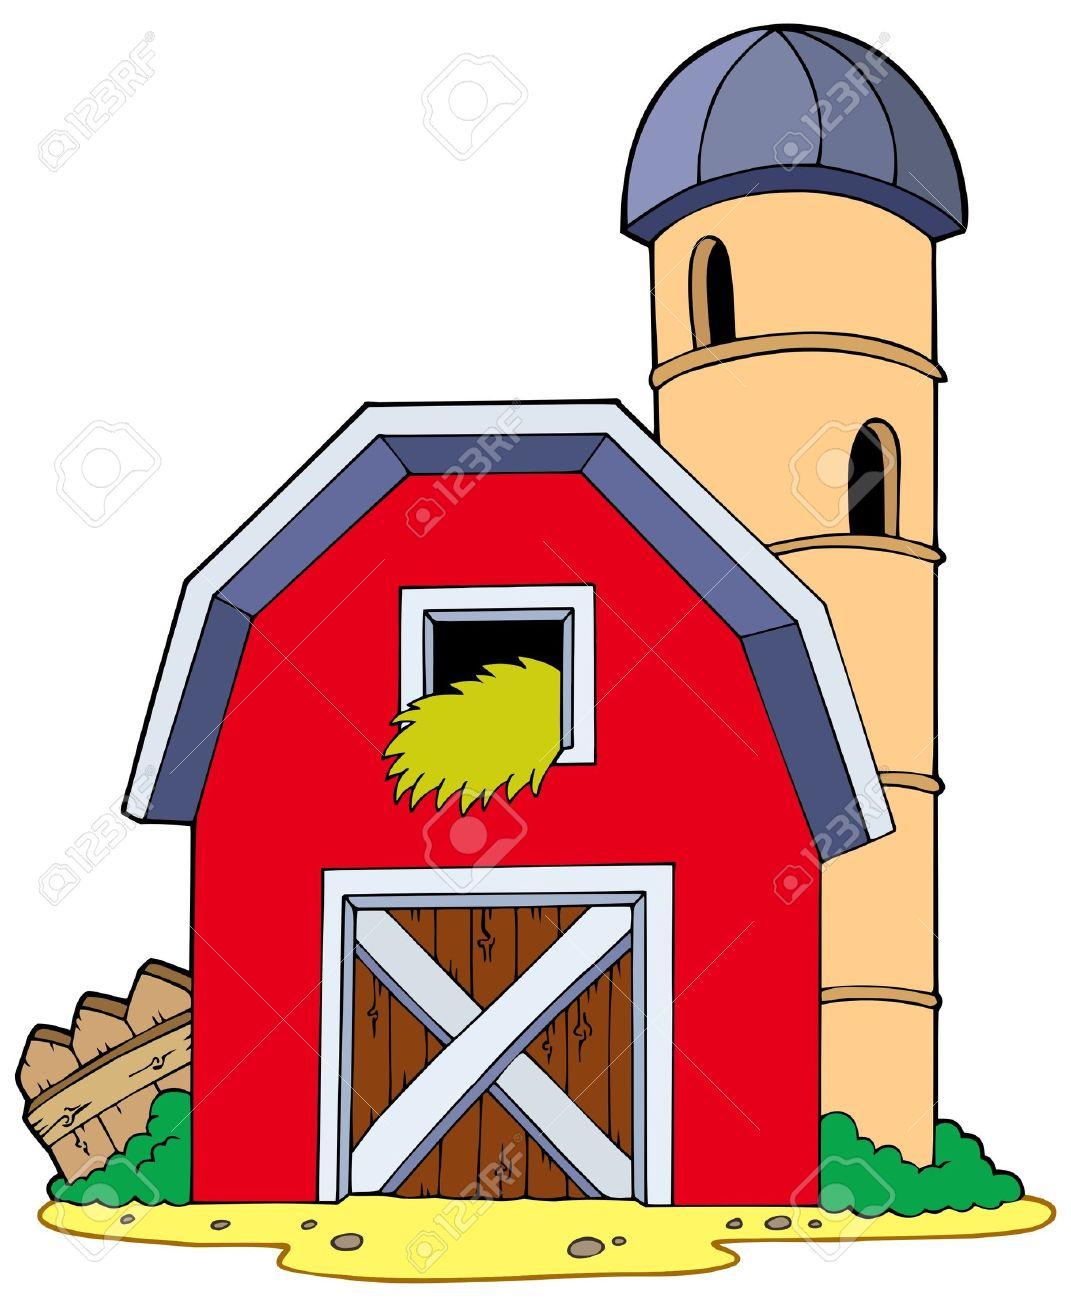 barn with granary illustration royalty free cliparts vectors